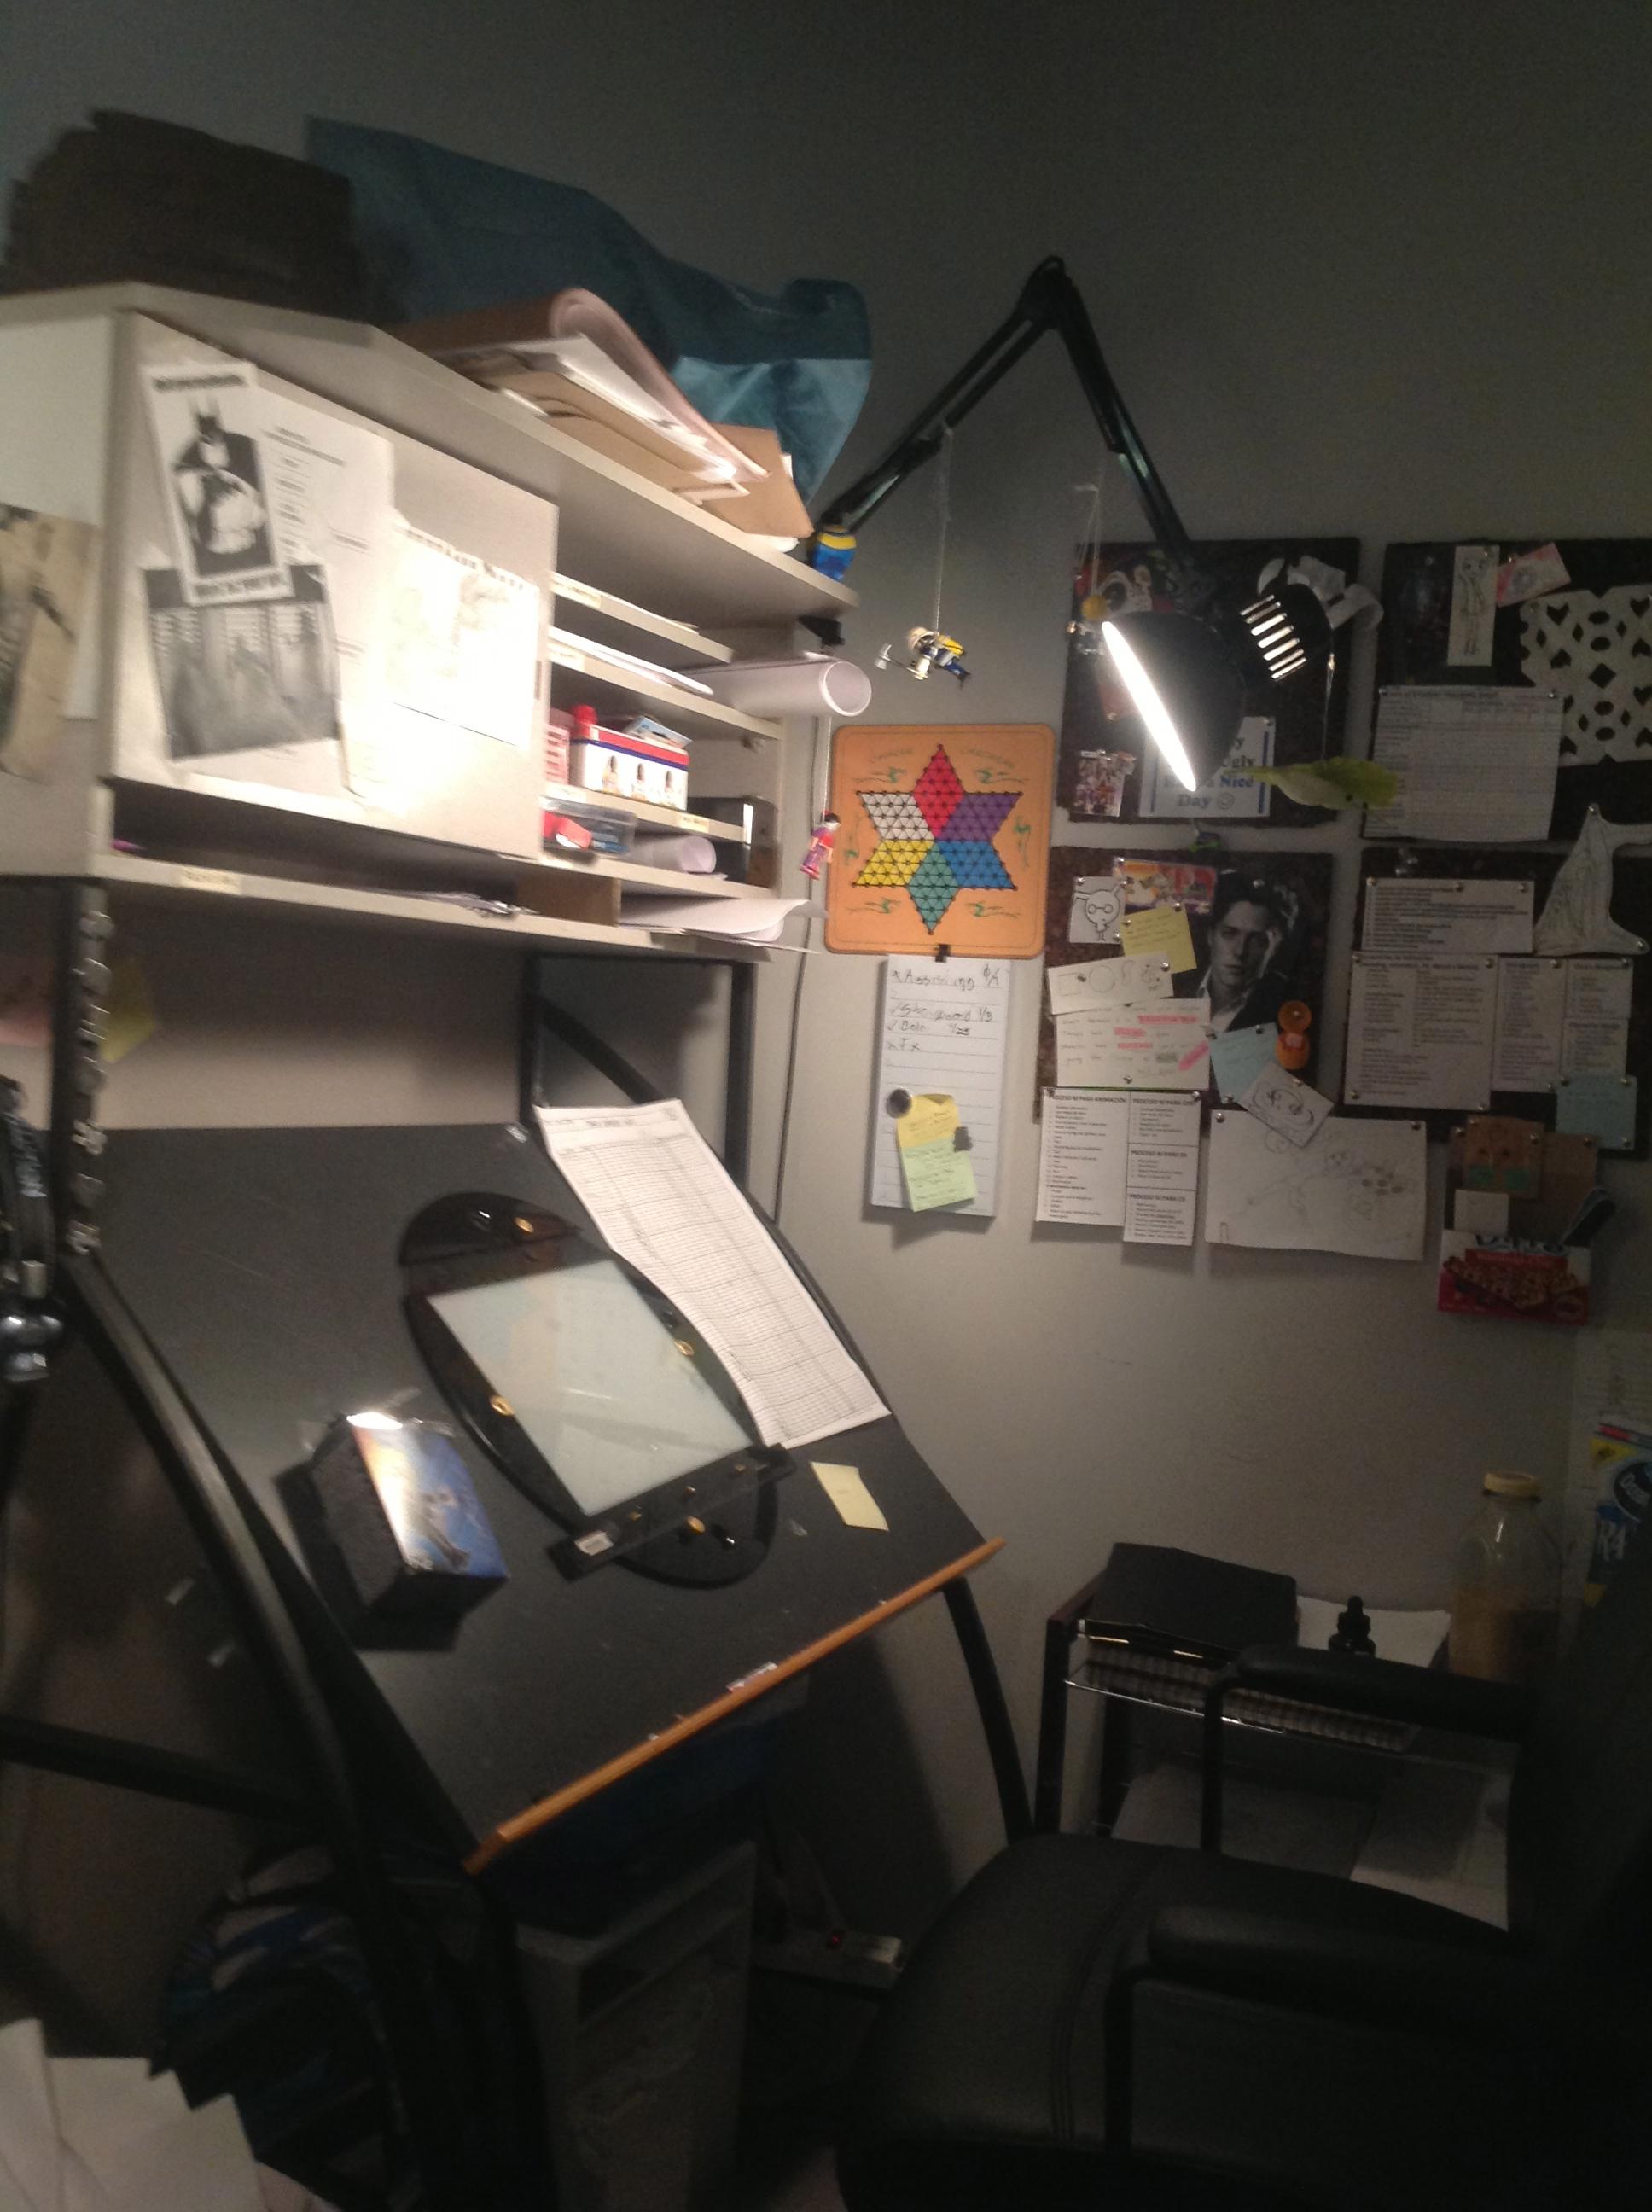 Classical Animation Desk, VFS Classical Animation Program 2012